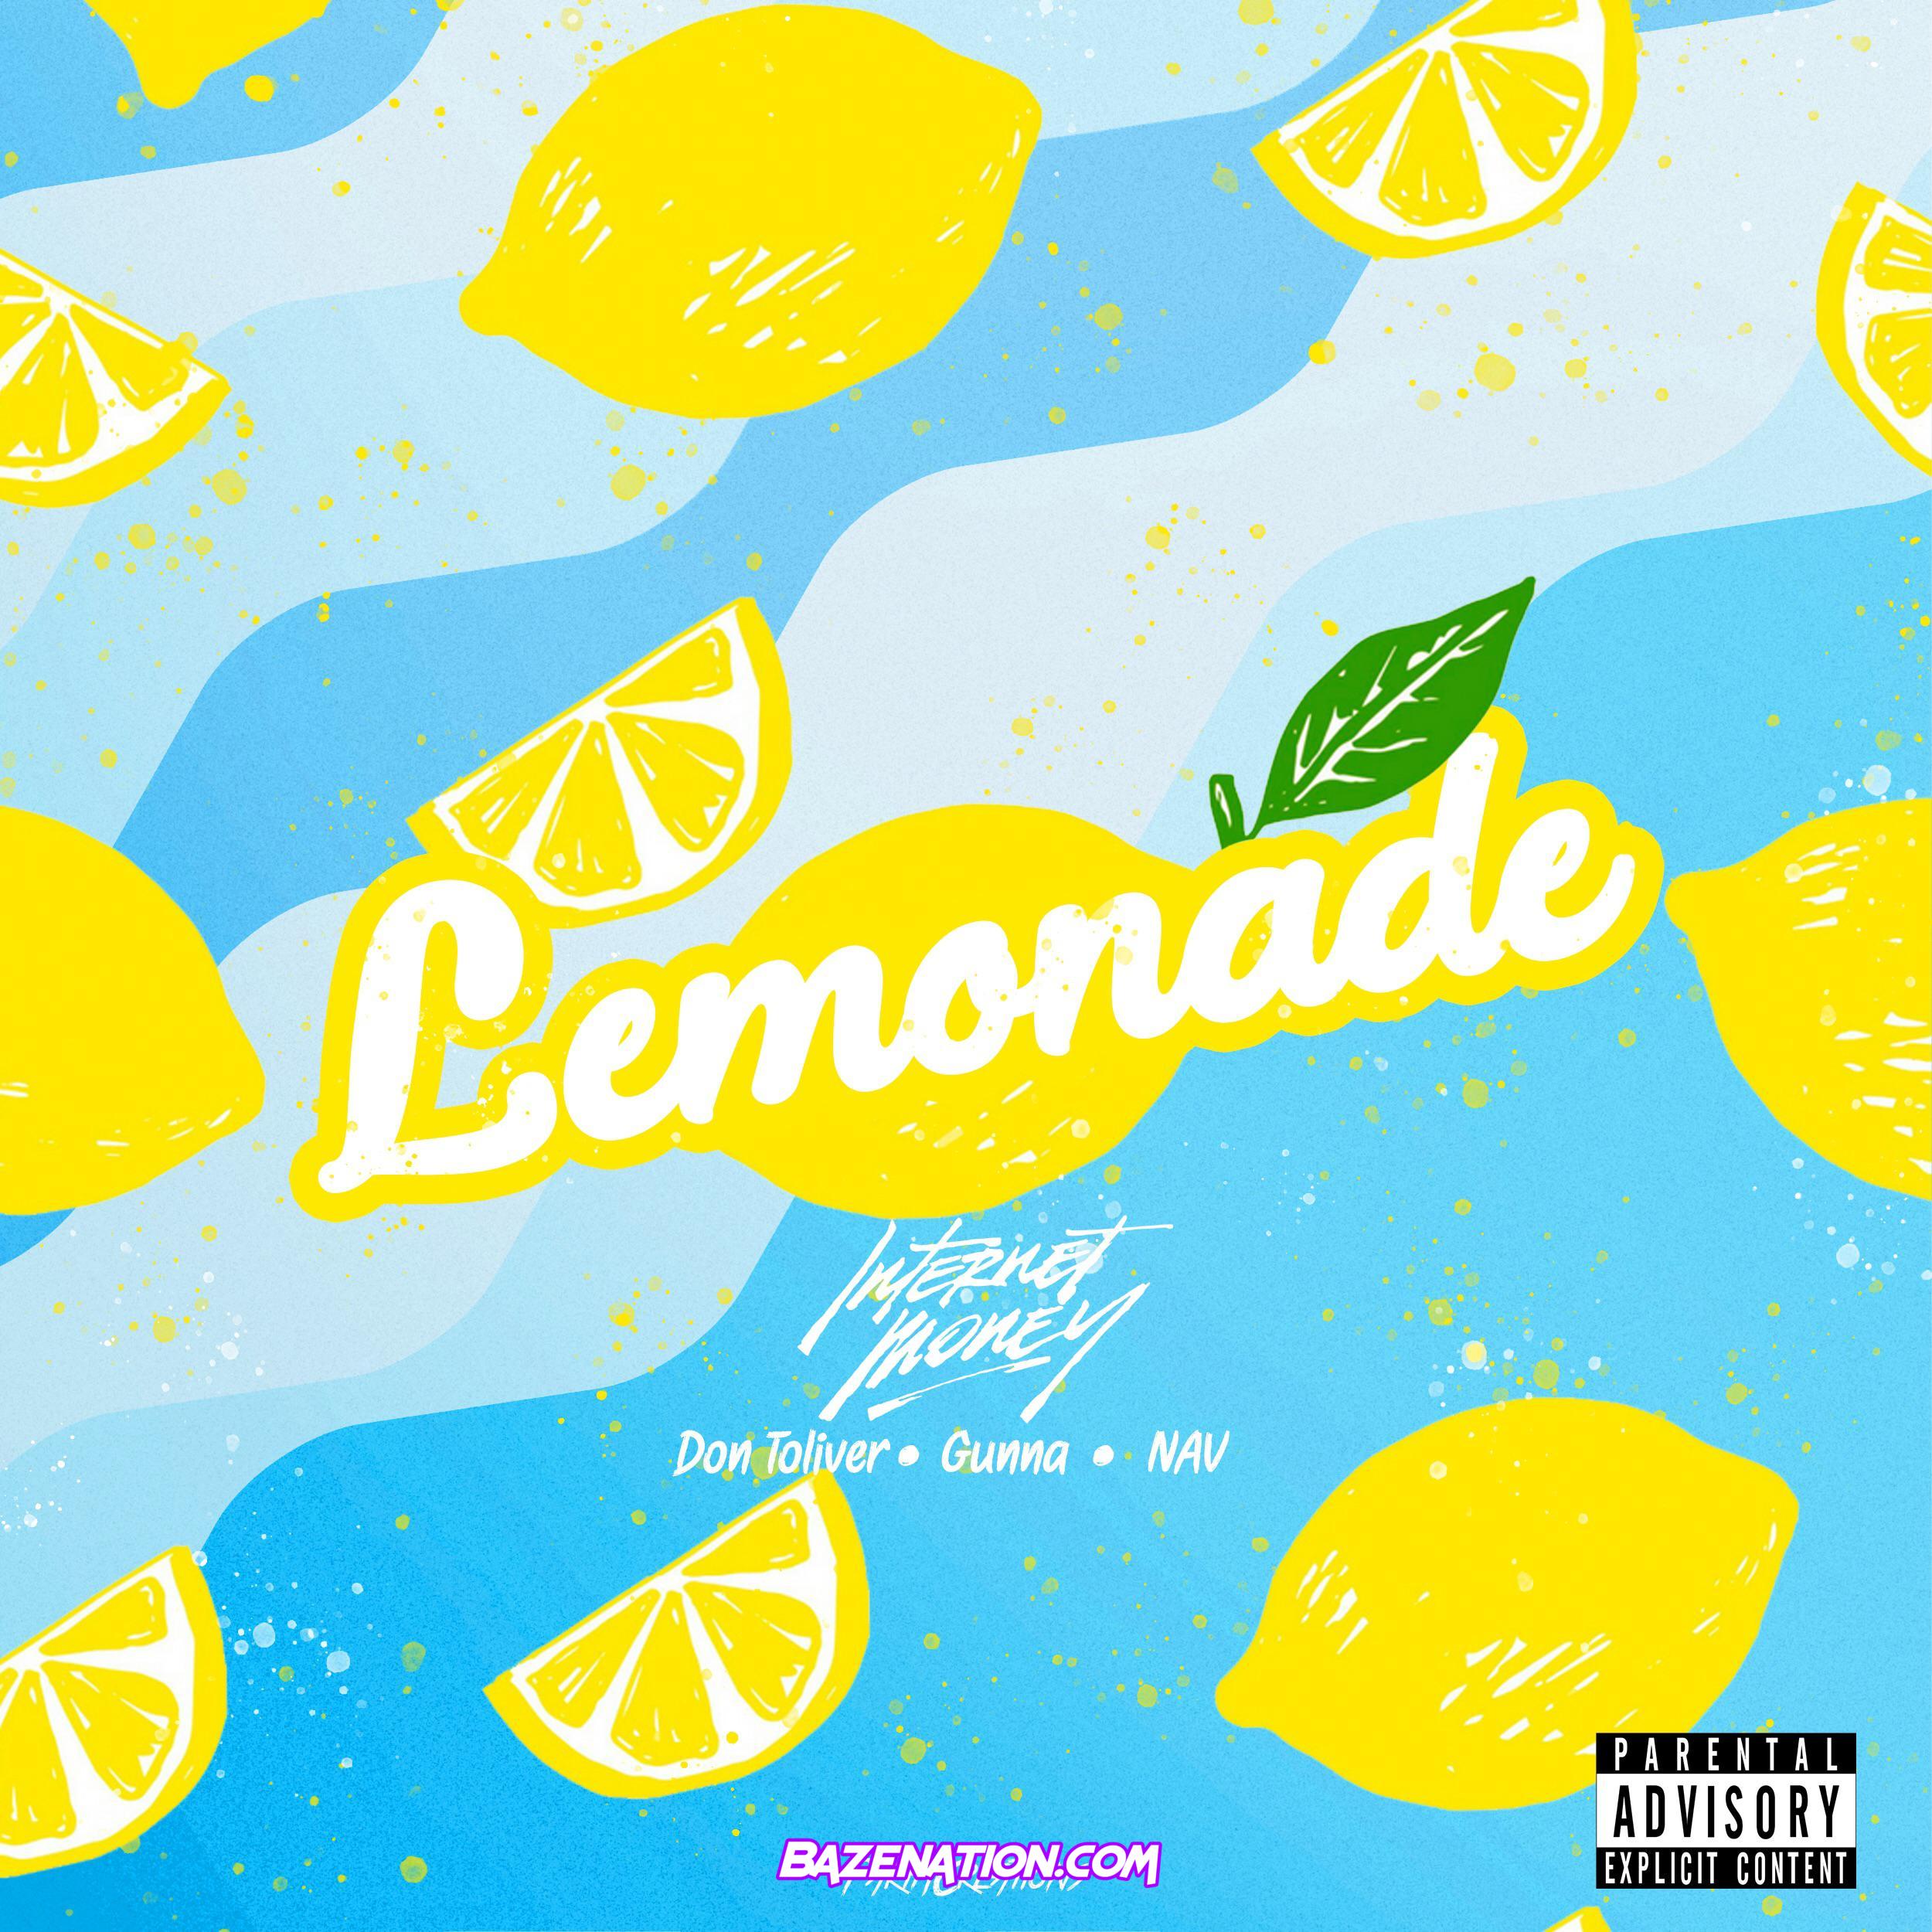 Download Mp3 Internet Money Lemonade Feat Gunna Don Toliver Nav Bazenation